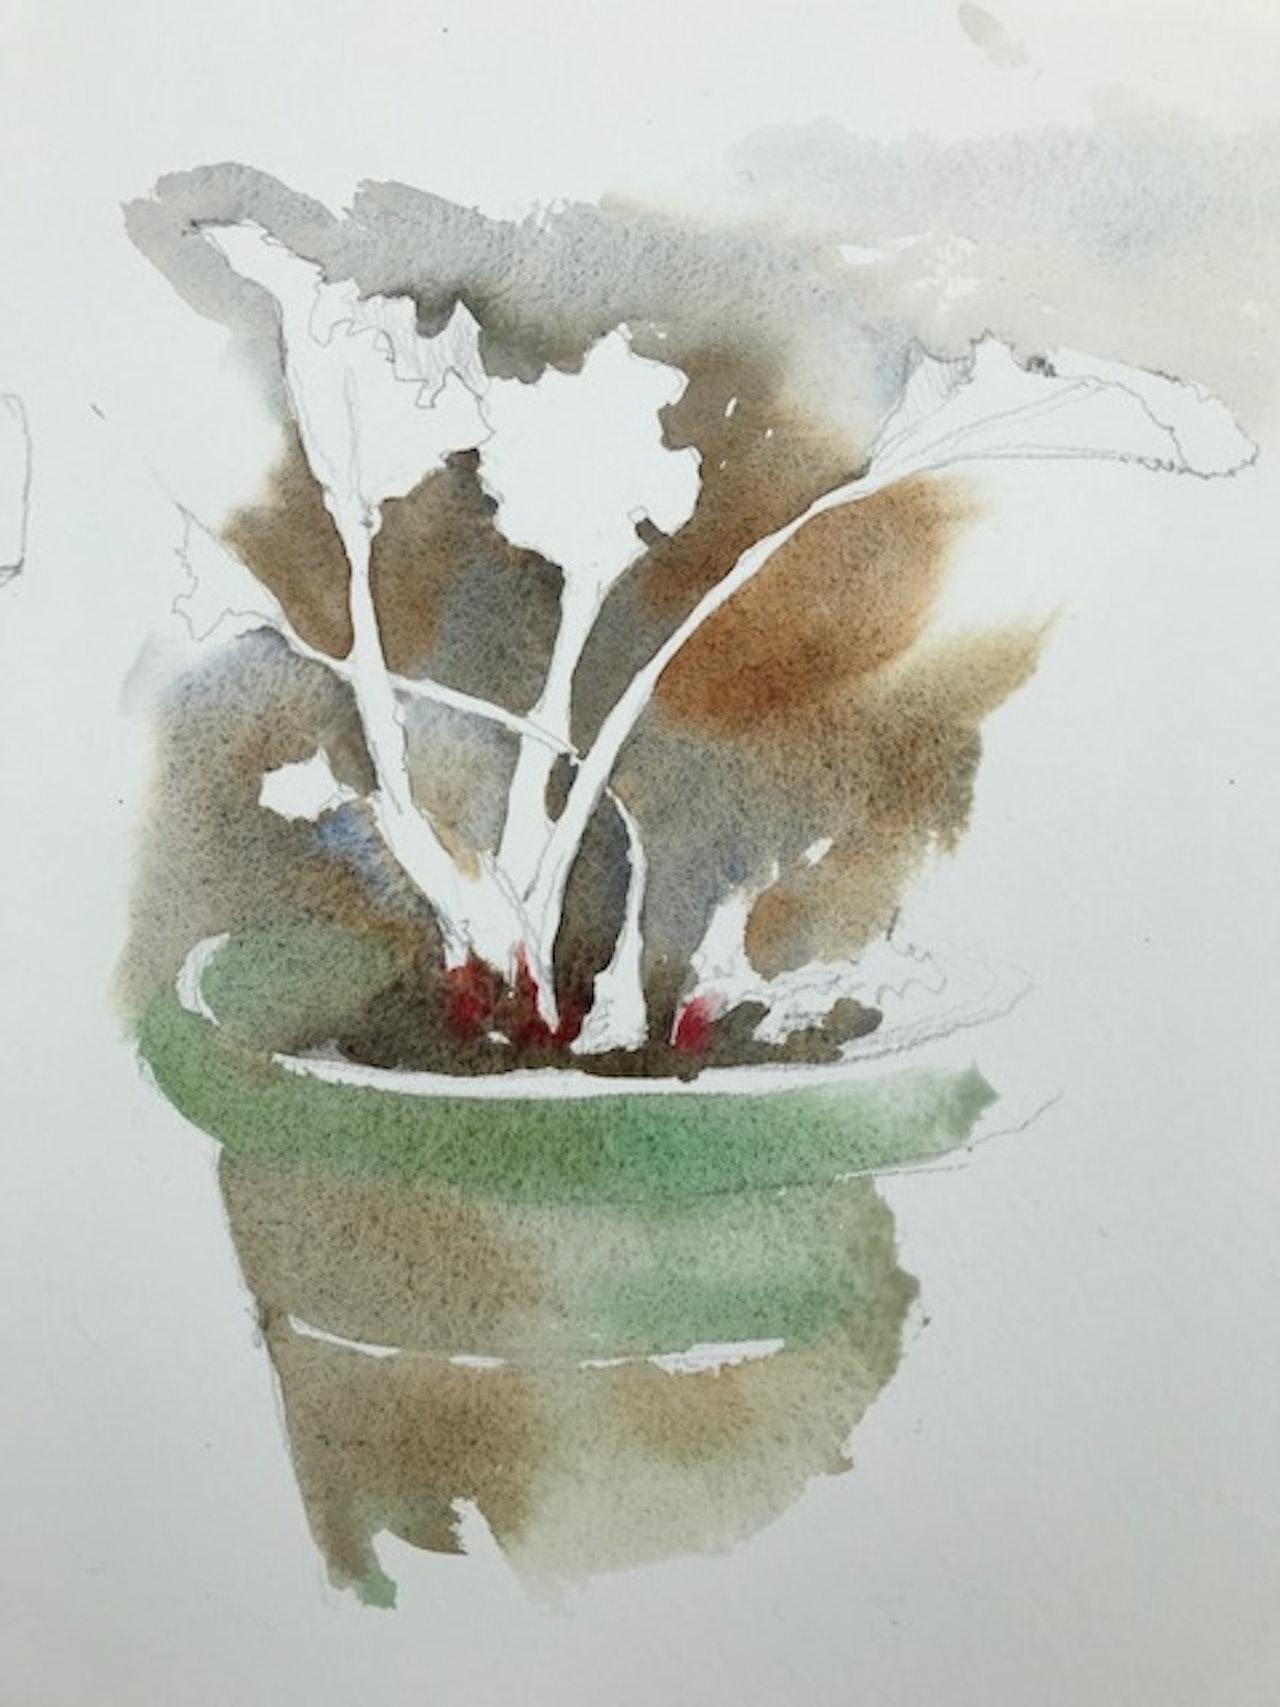 Early Rhubarb backwash